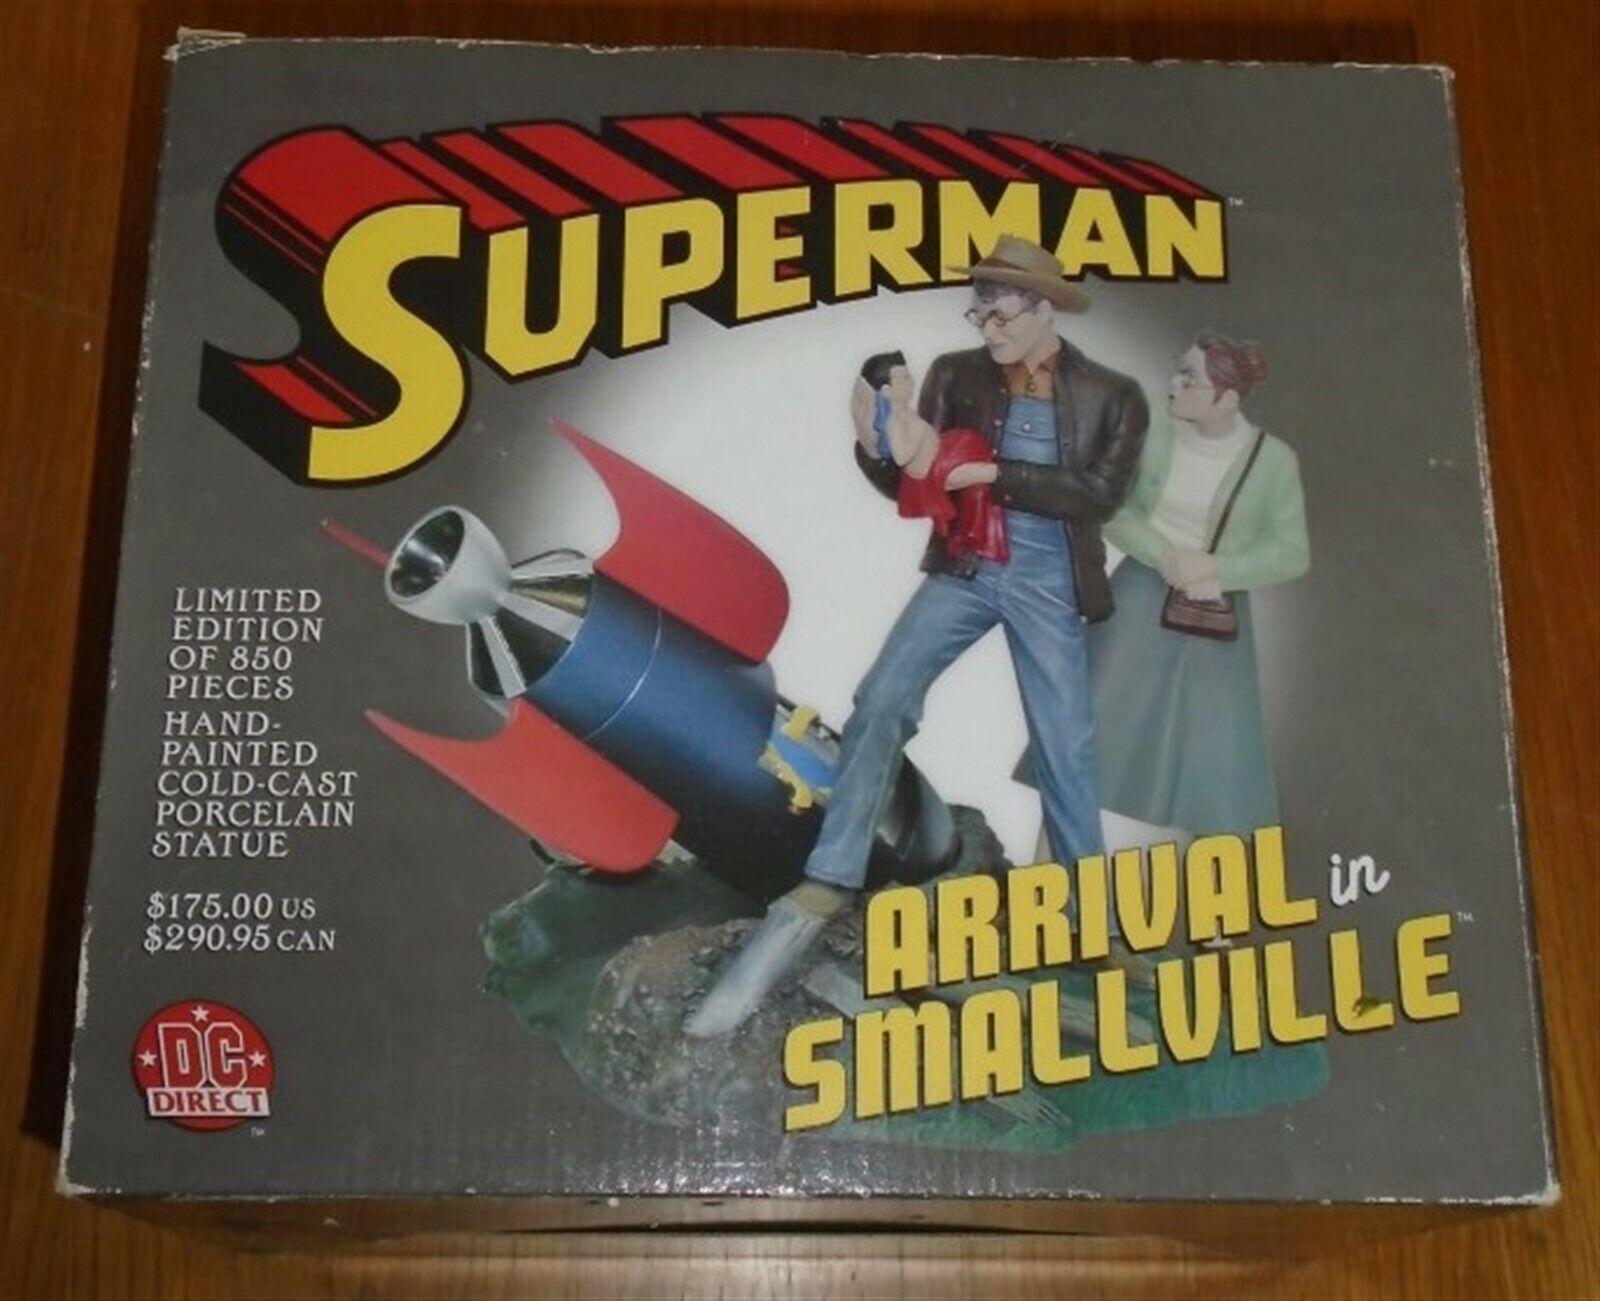 Superman Arrival in Smallville DC Direct Porcelain Statue Ltd 850